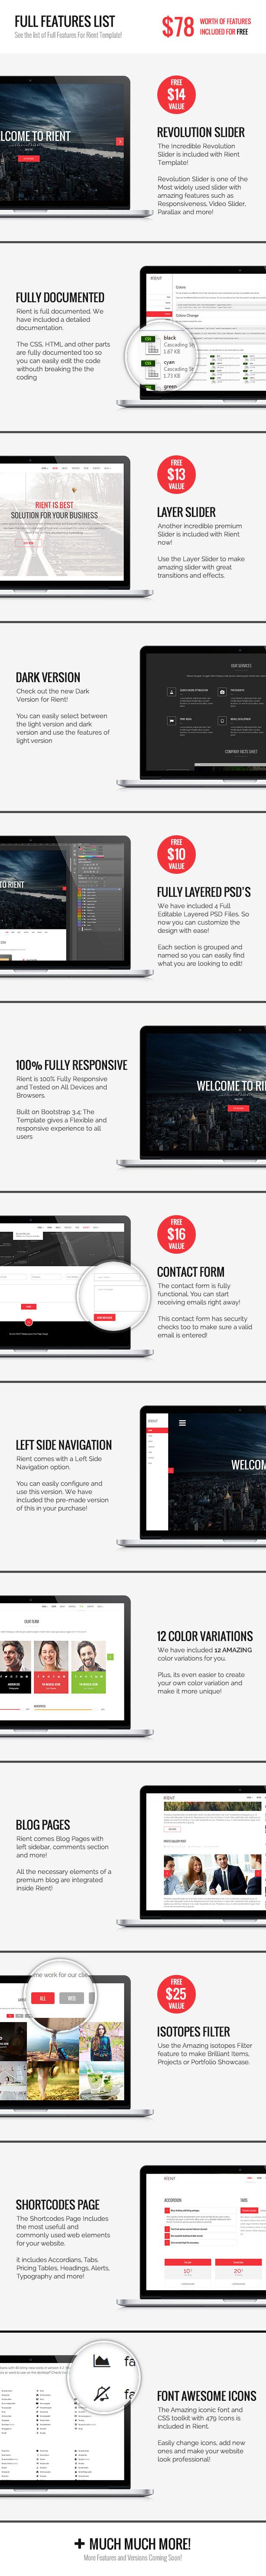 Rient | Multi-Purpose Parallax Landing Page - 4